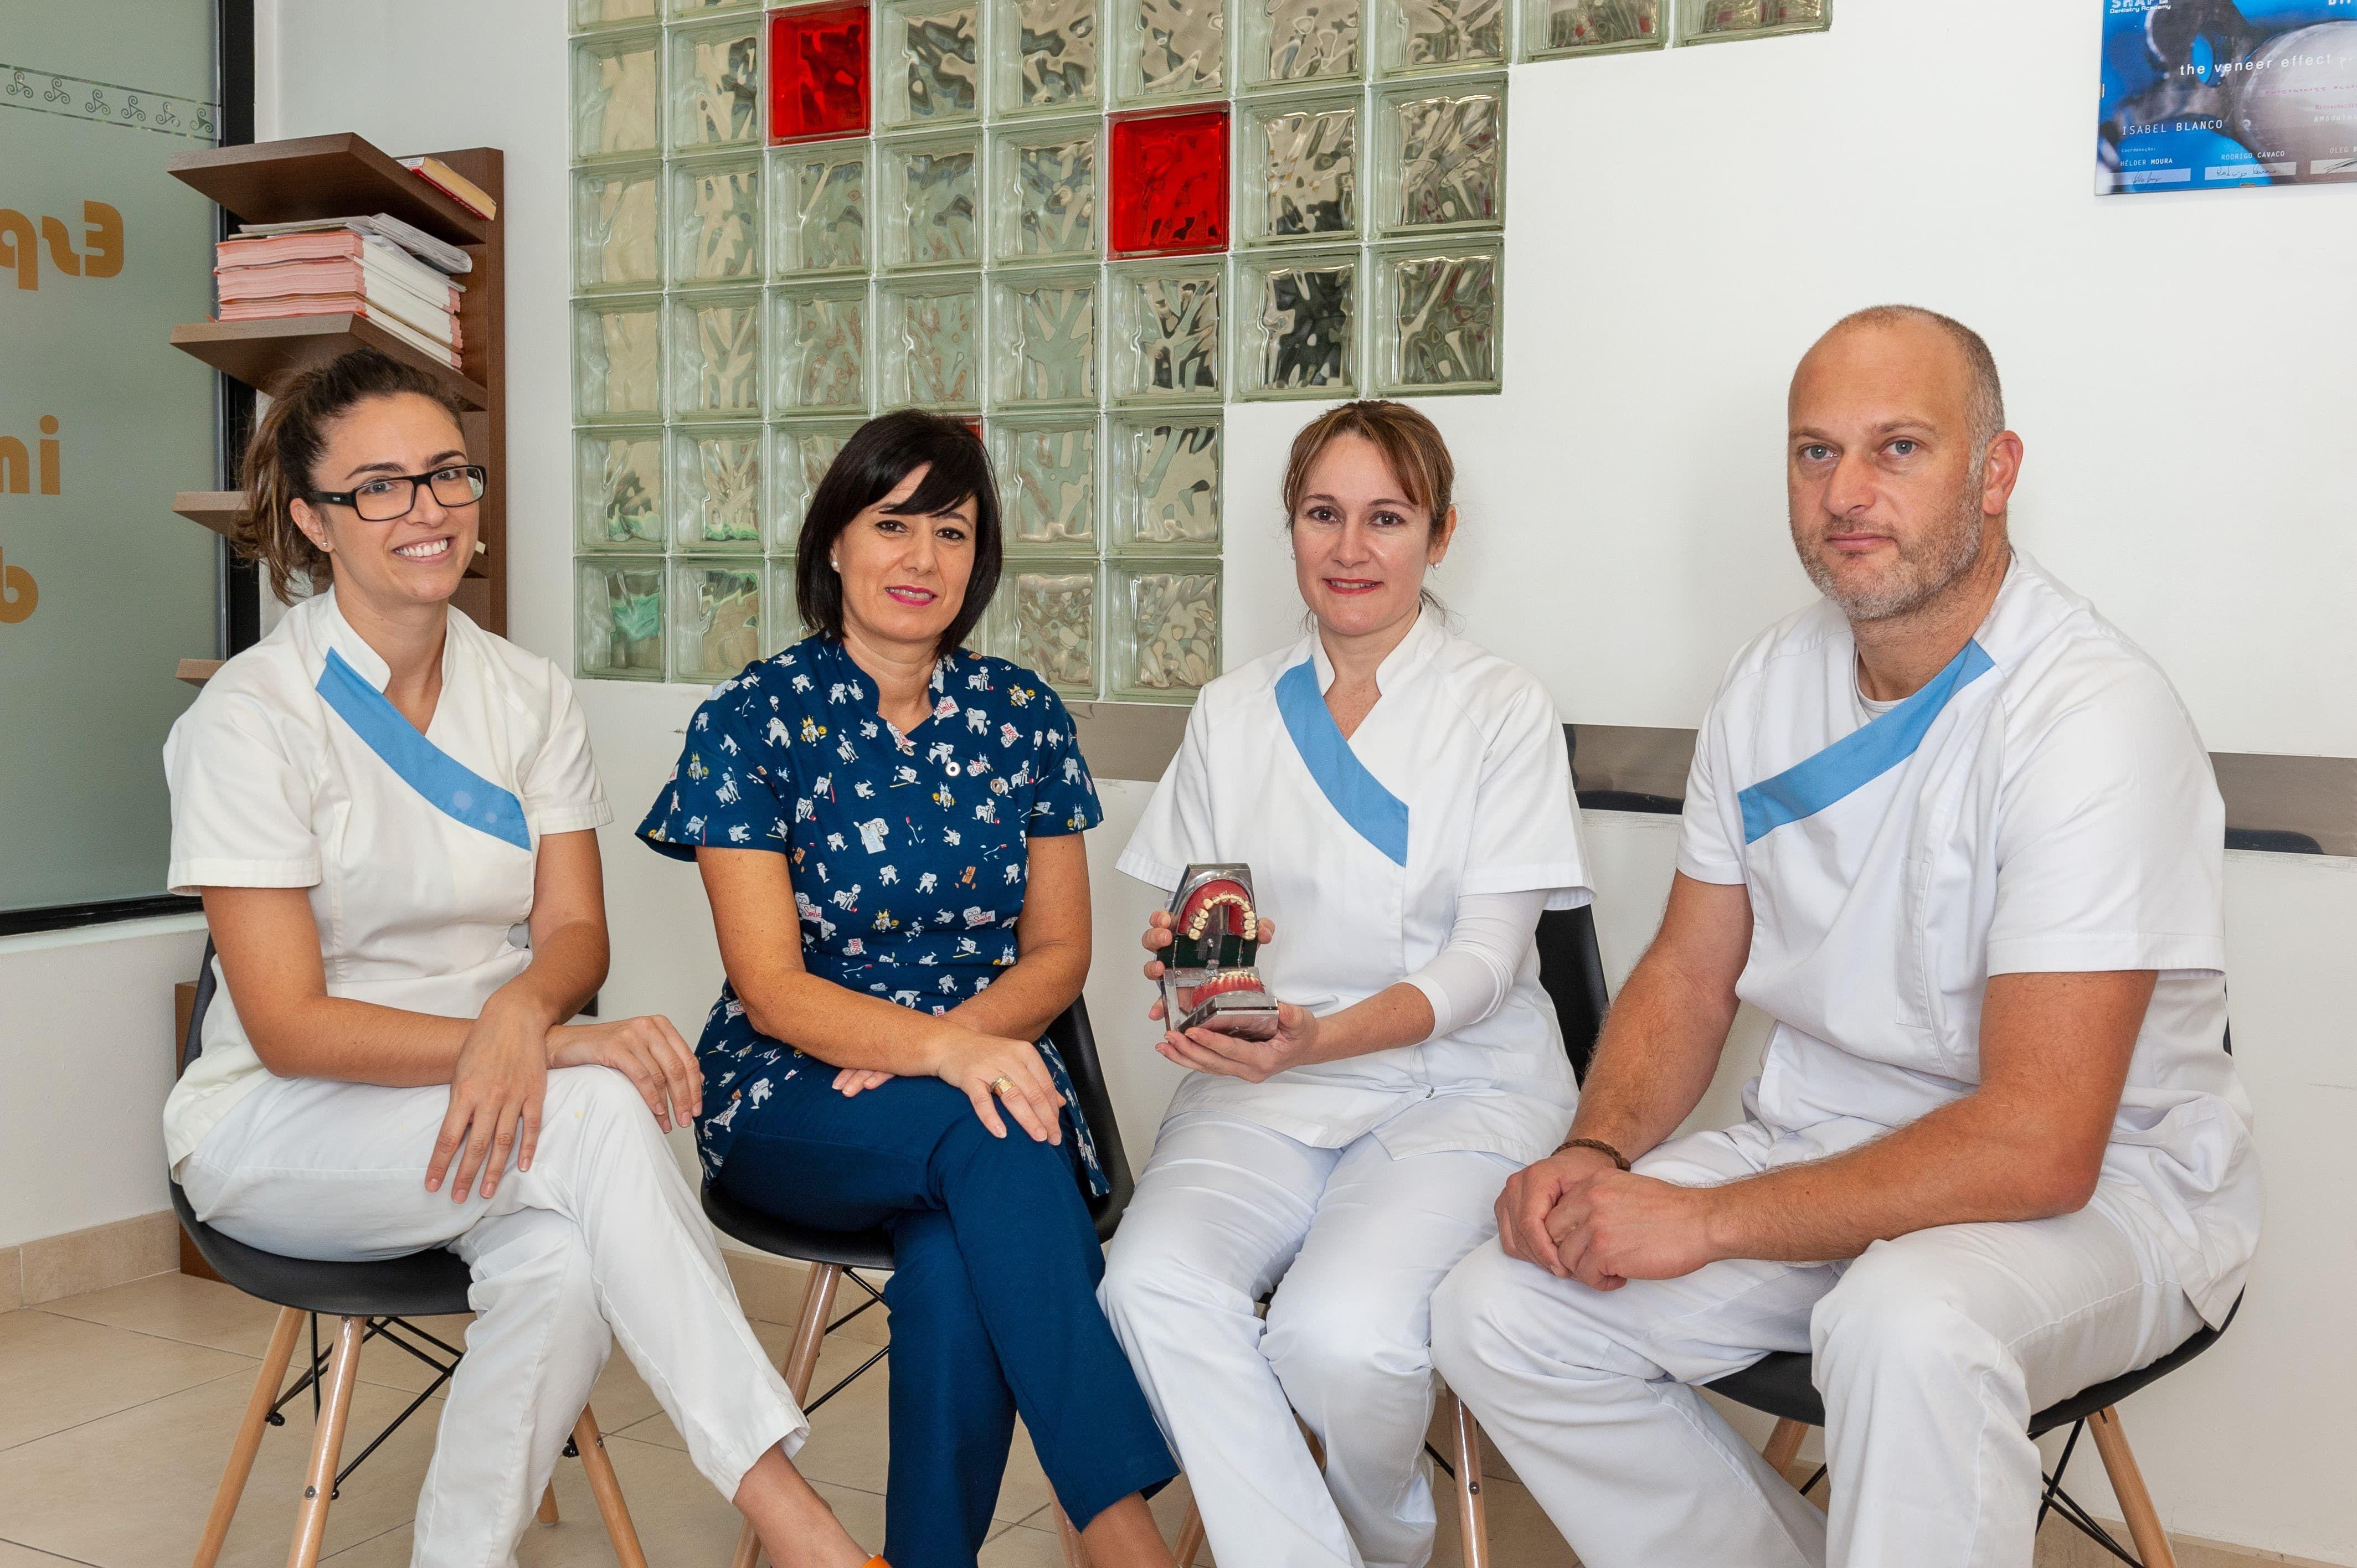 Foto 2 de Clínicas dentales en O Milladoiro | Clínica Implanteoral Milladoiro